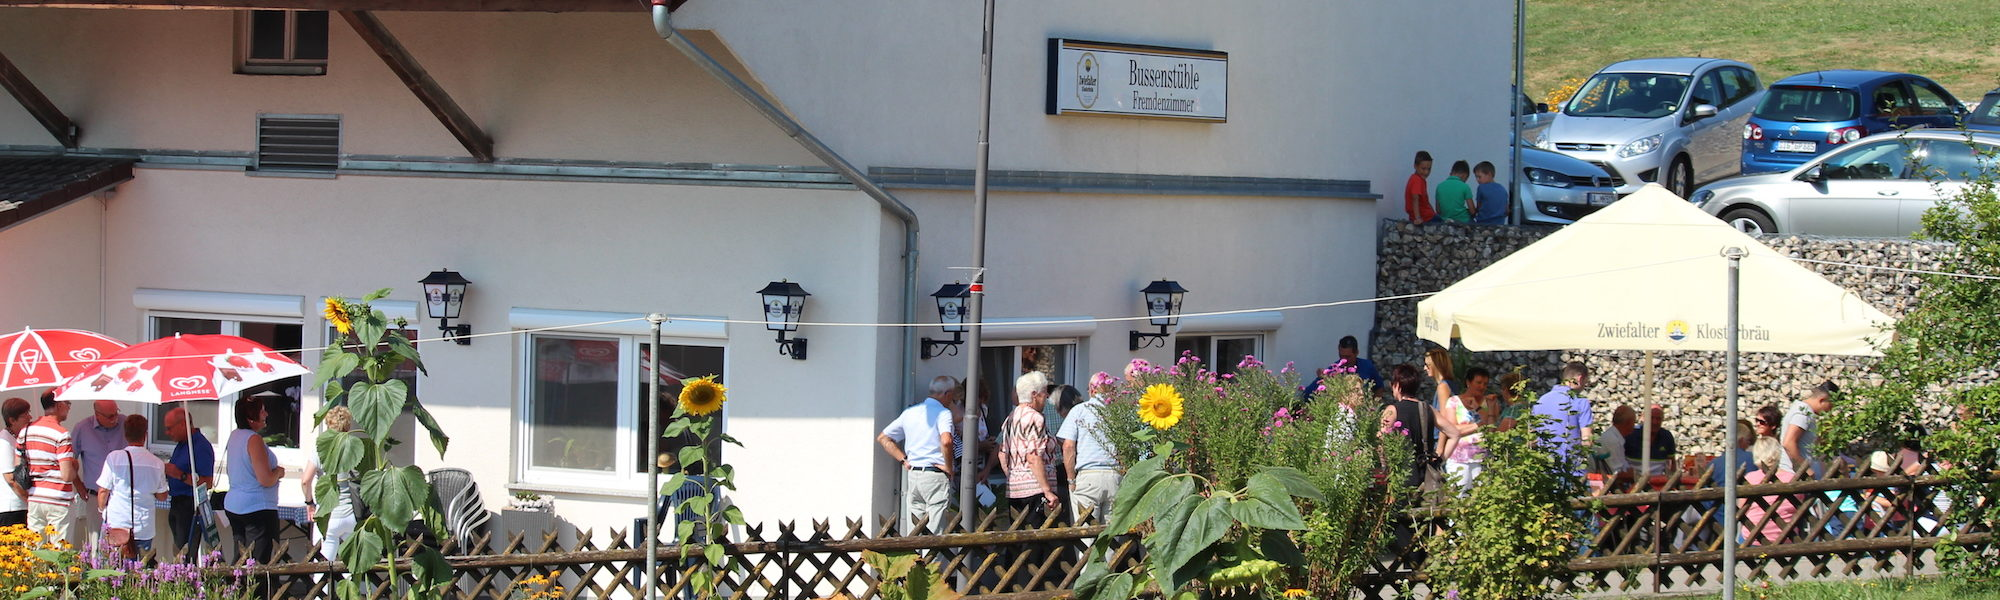 Restaurant bei Biberach